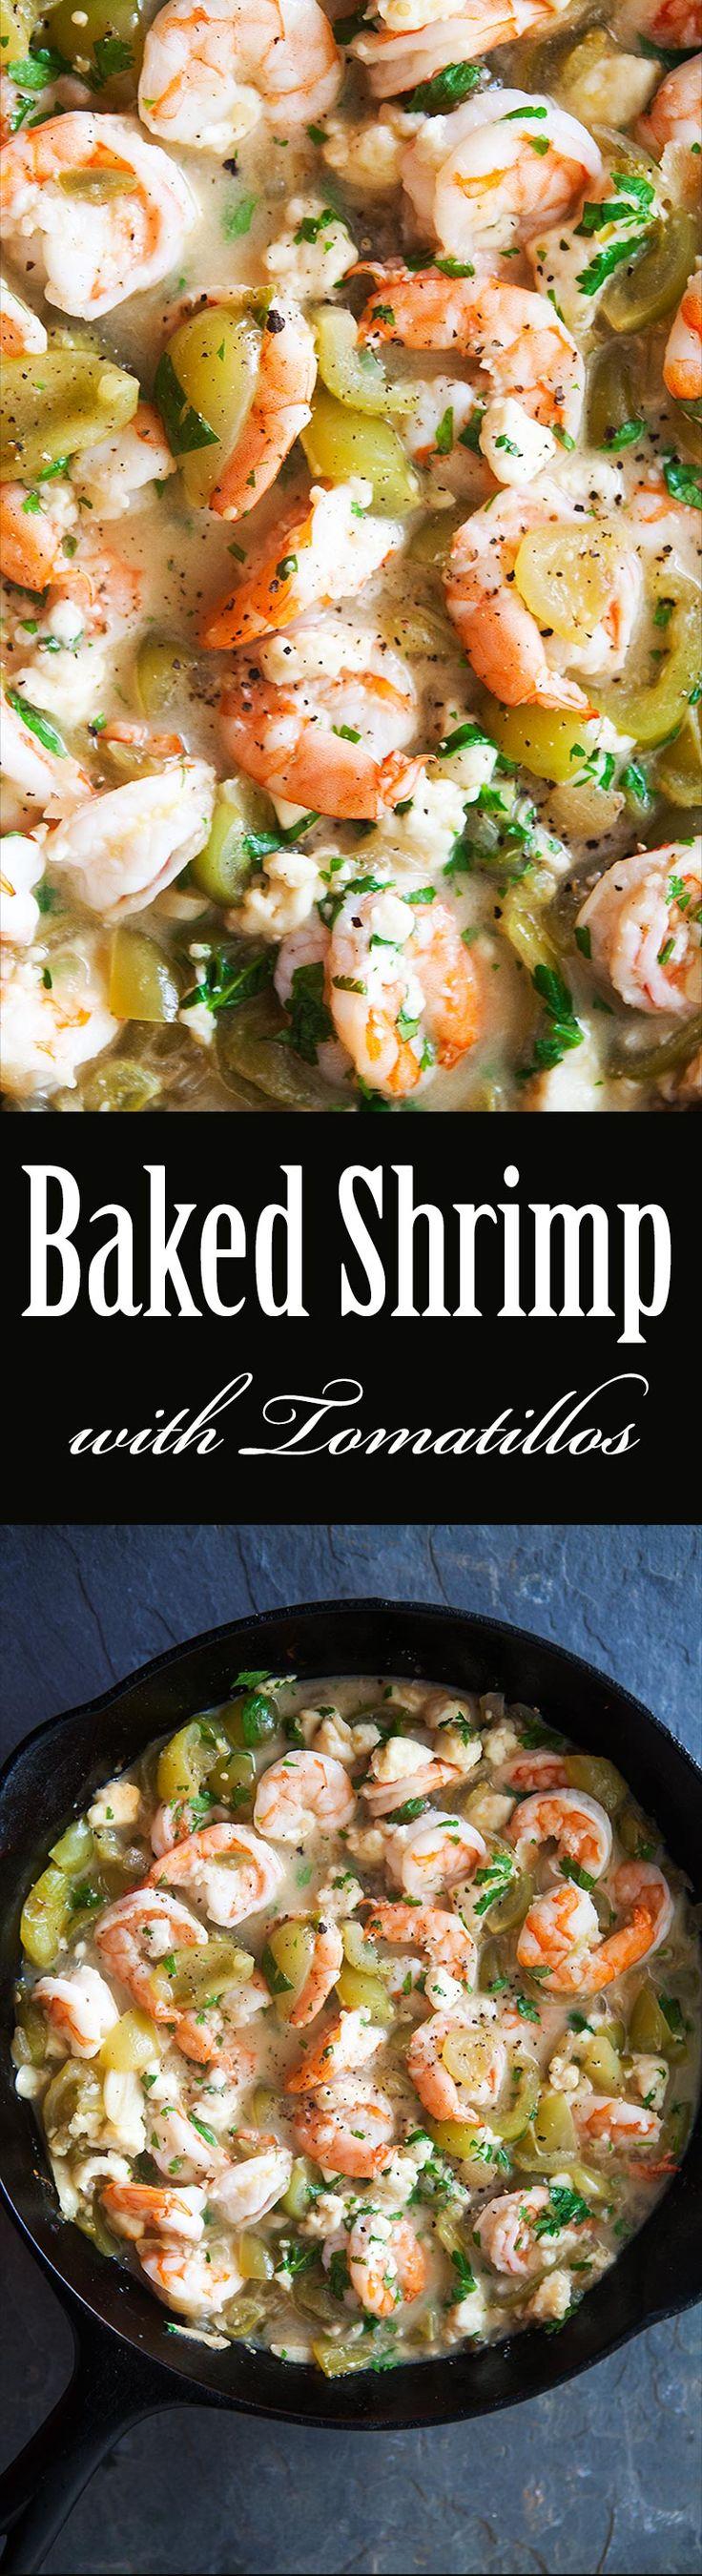 Baked Shrimp with Tomatillos | Recipe | Baked Shrimp, Shrimp Dishes ...